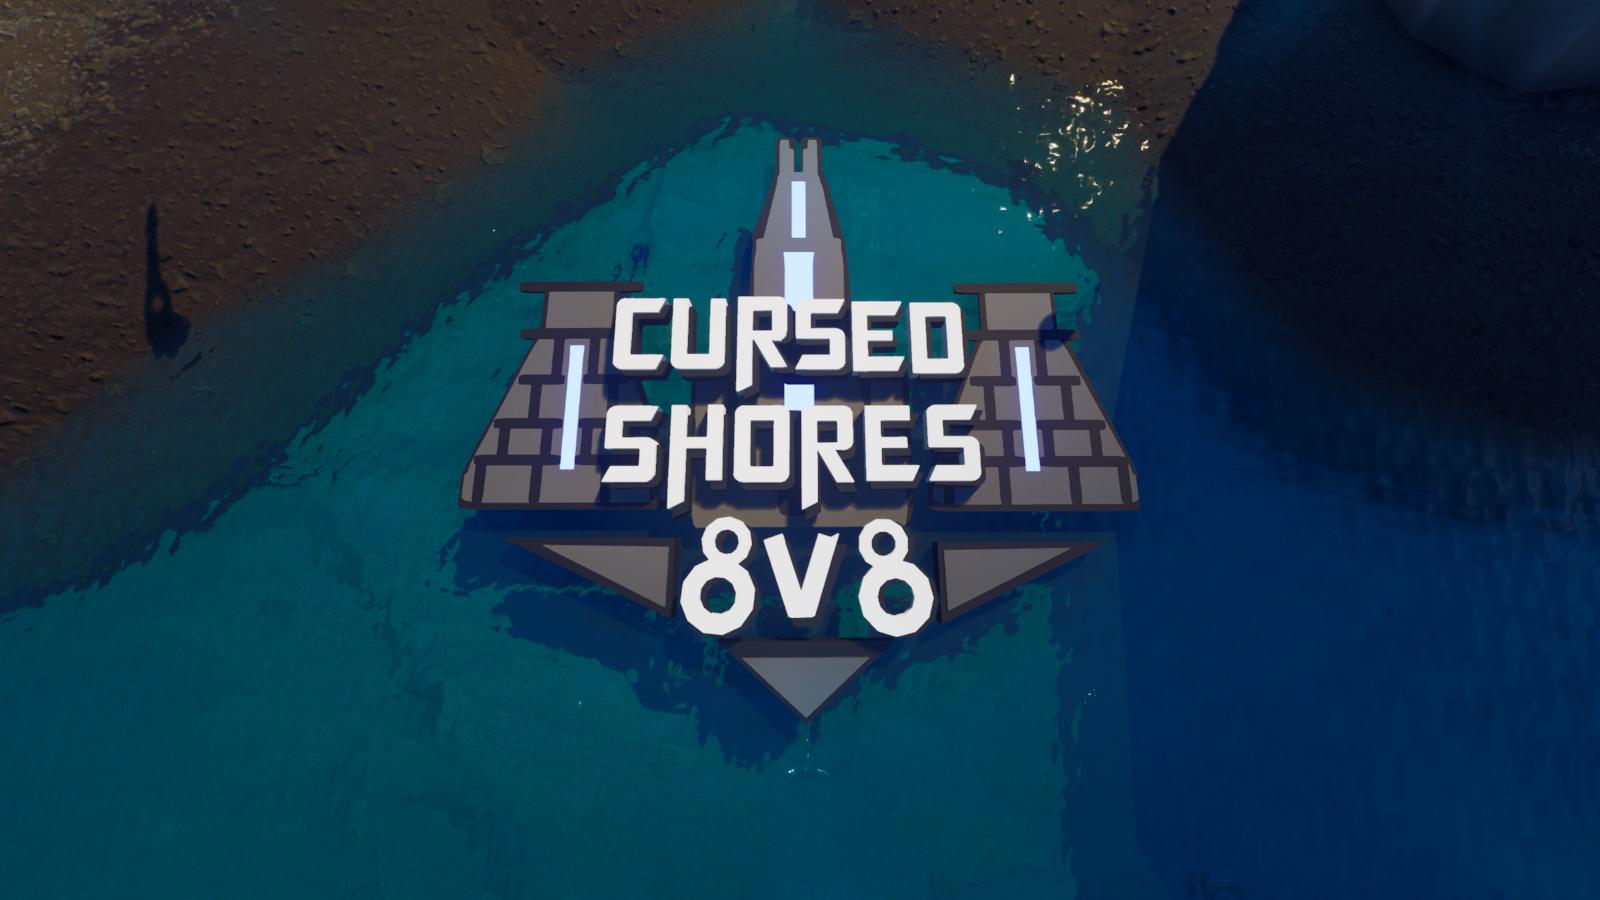 Cursed Shores 💀💯 - 8v8 6760-9430-6957 by fivewalnut